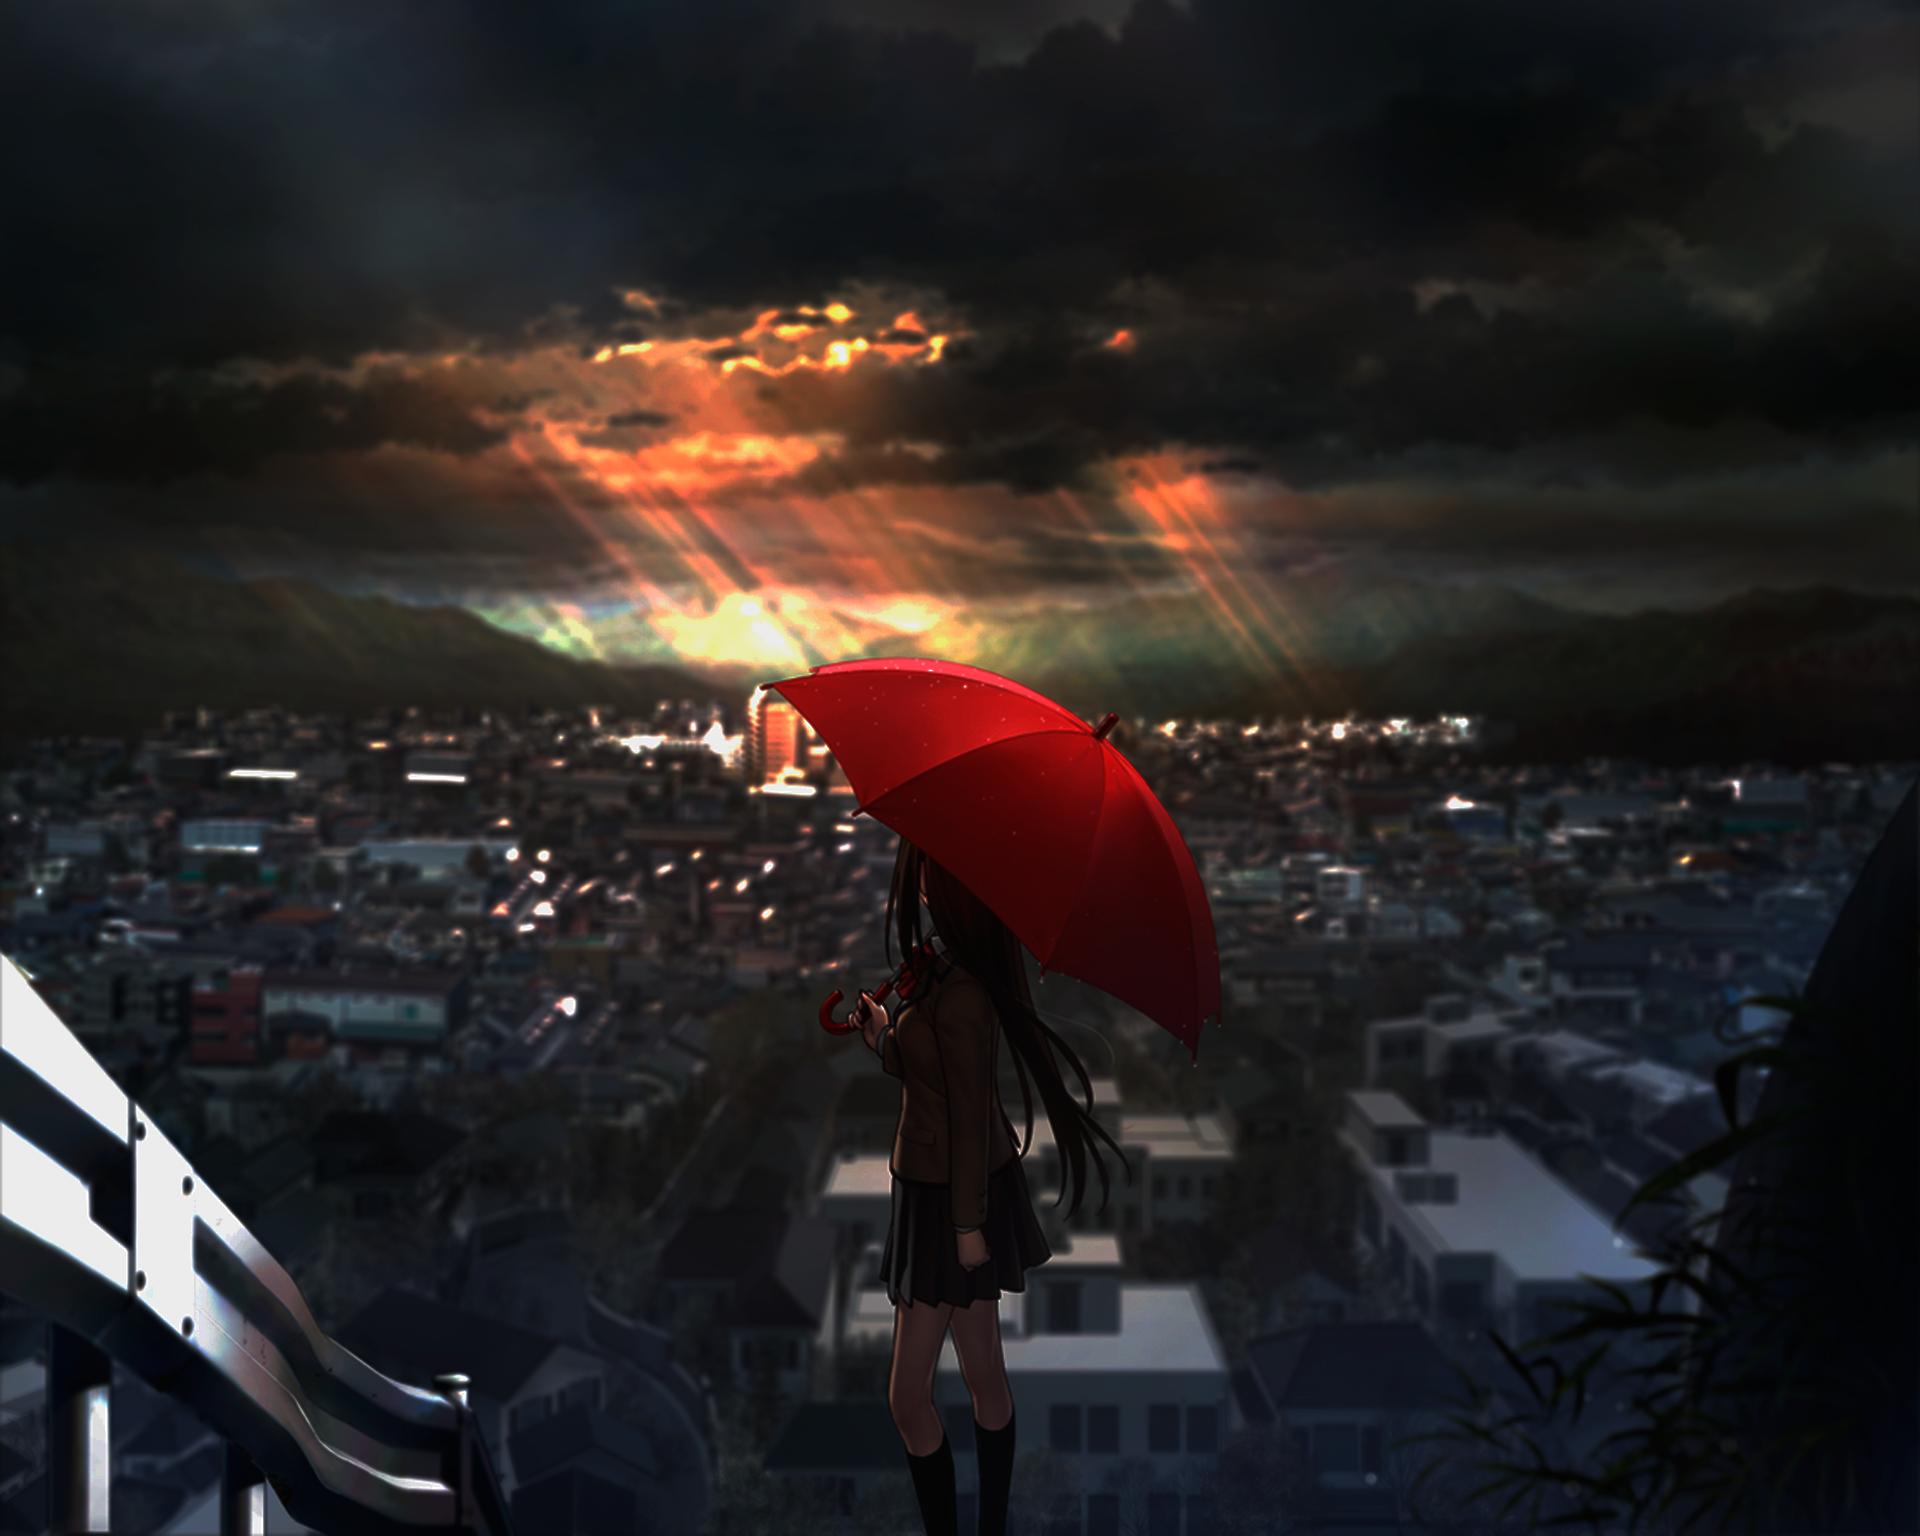 Wallpaper Sunlight Sunset Night Anime Girls Sky Evening